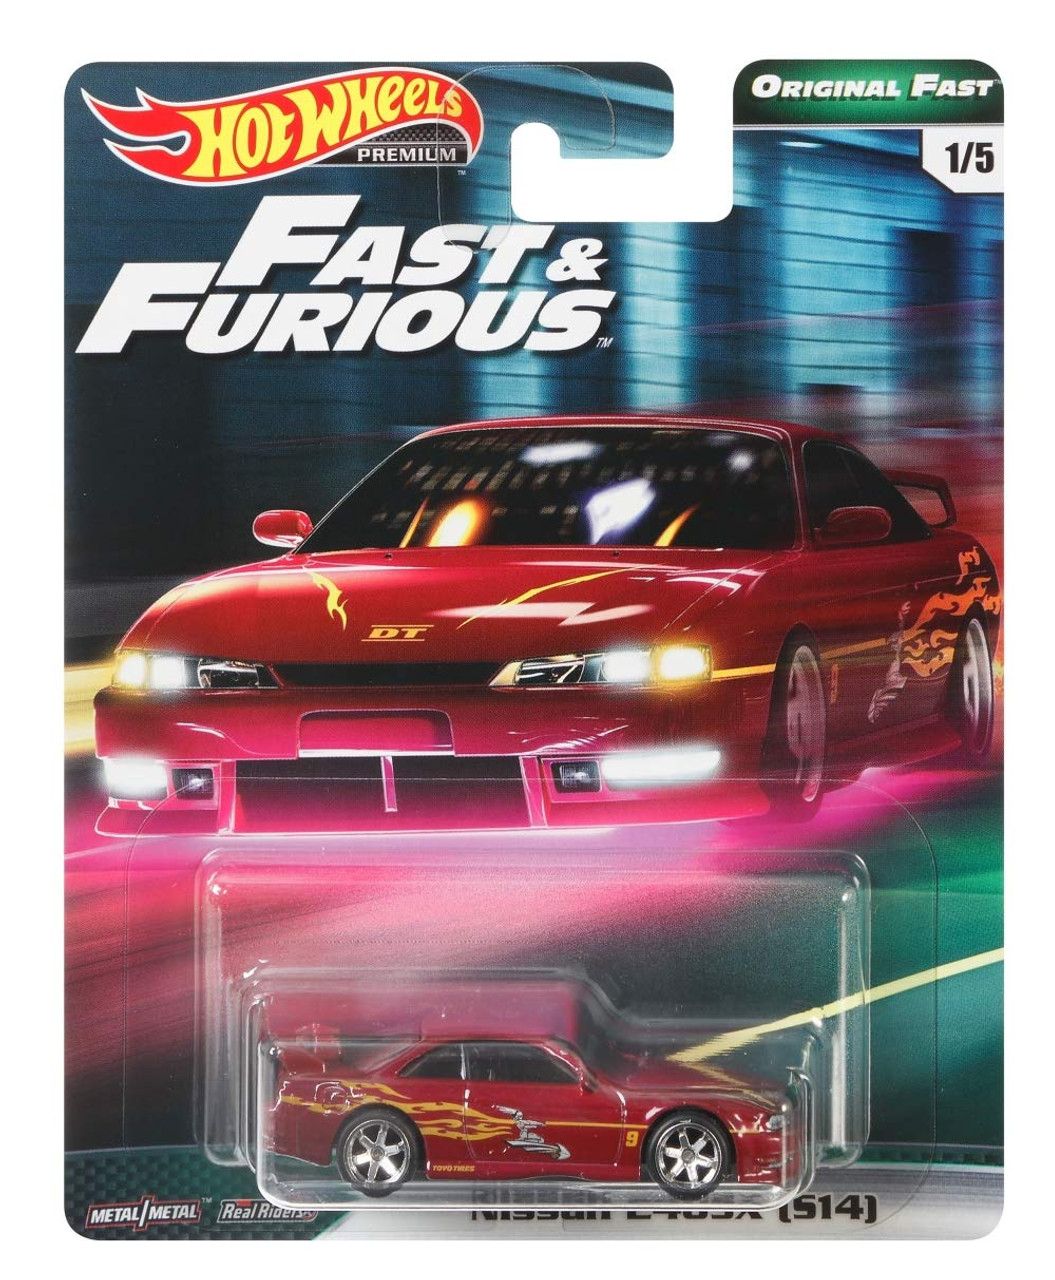 Nissan 240sx S14 Hot Wheels Original Fast Hnrs Oc